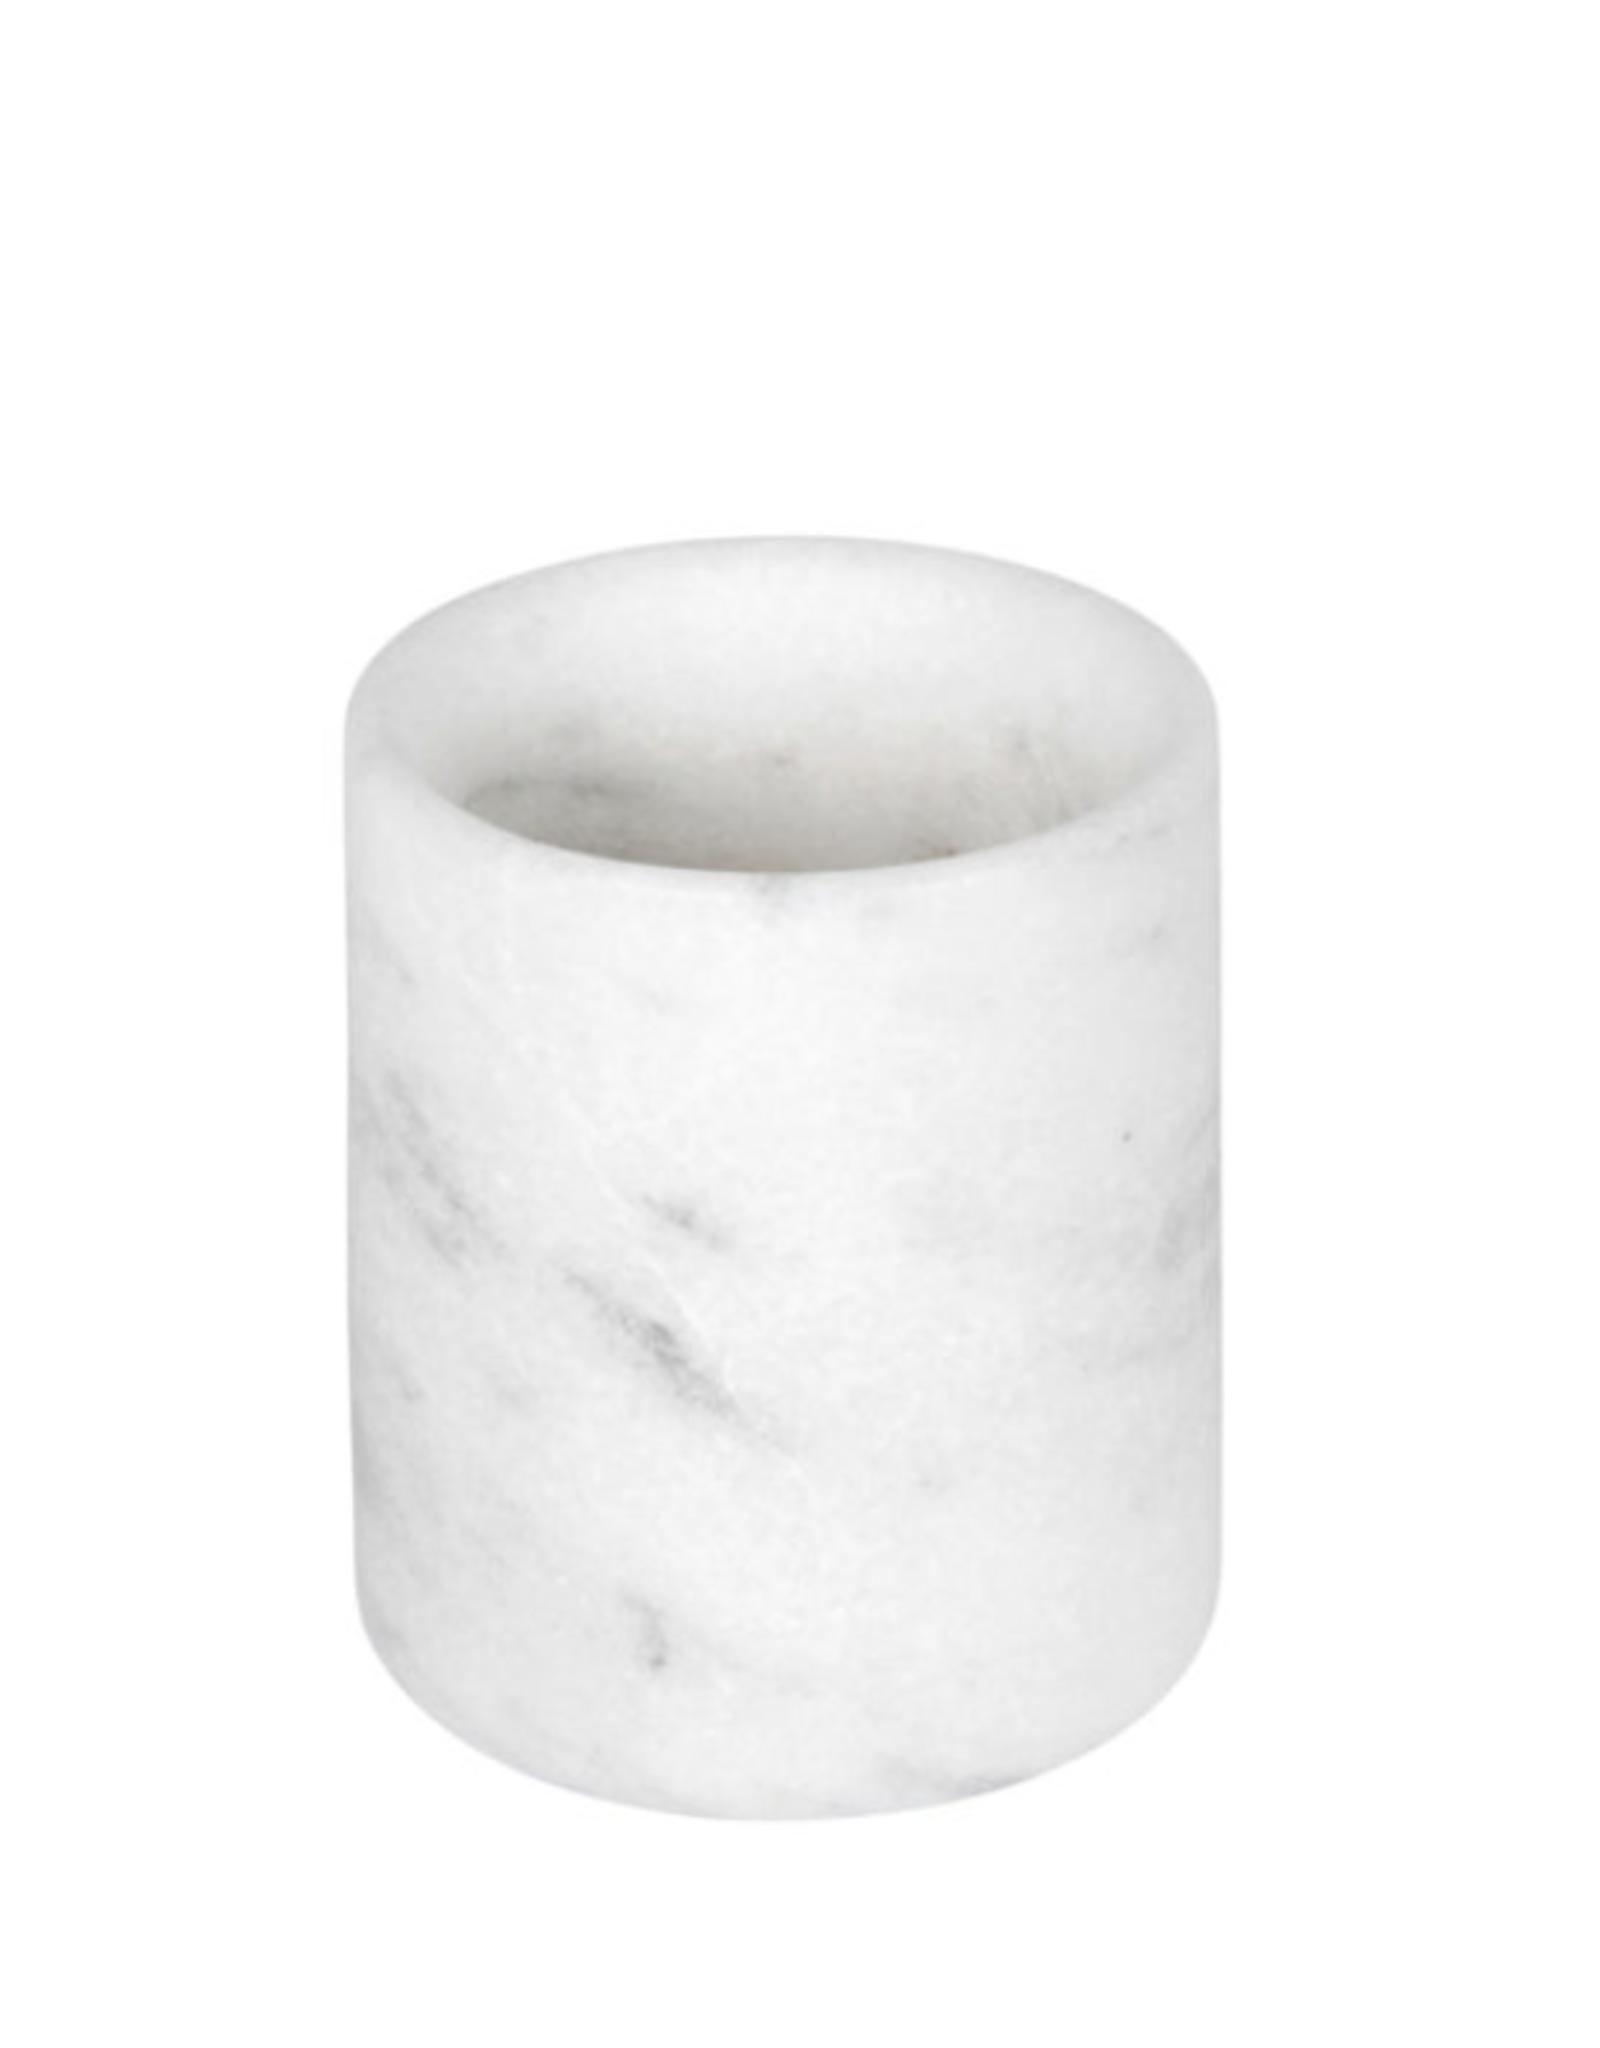 Stoned - White Marble -Toothbrush Holder